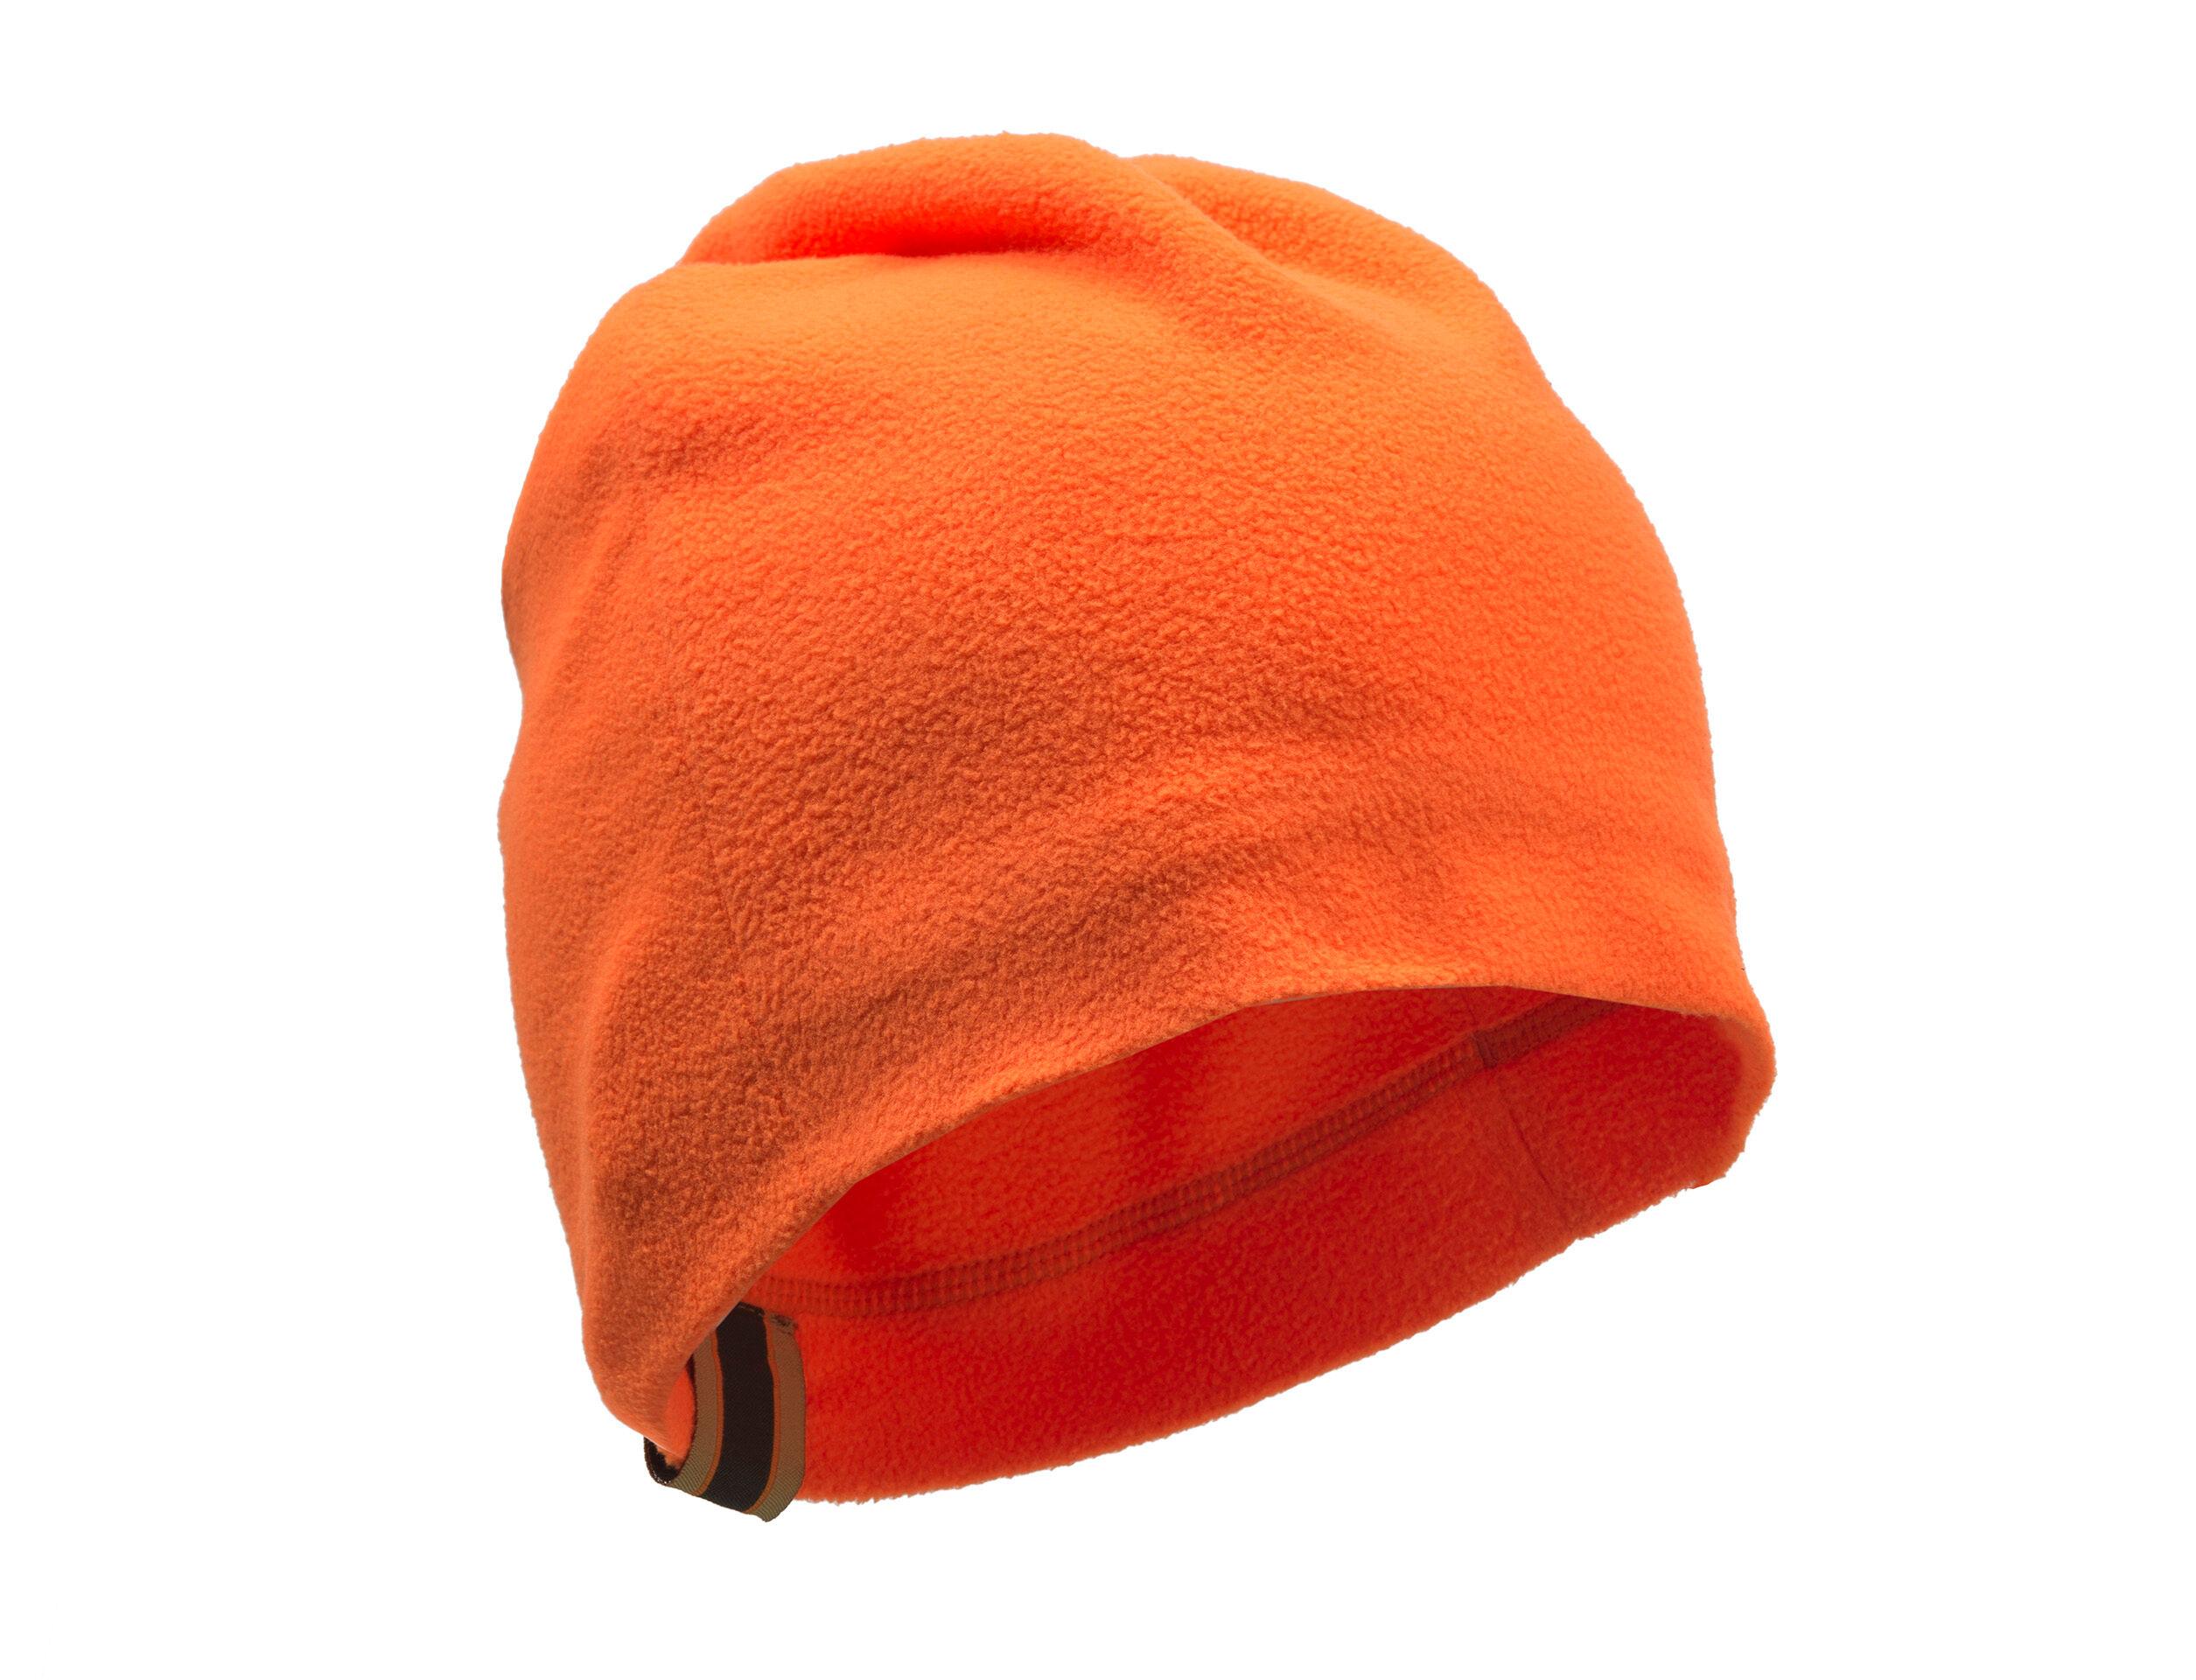 BerettaUSA   Beanie in Blaze Orange, Fleece, Size: Large